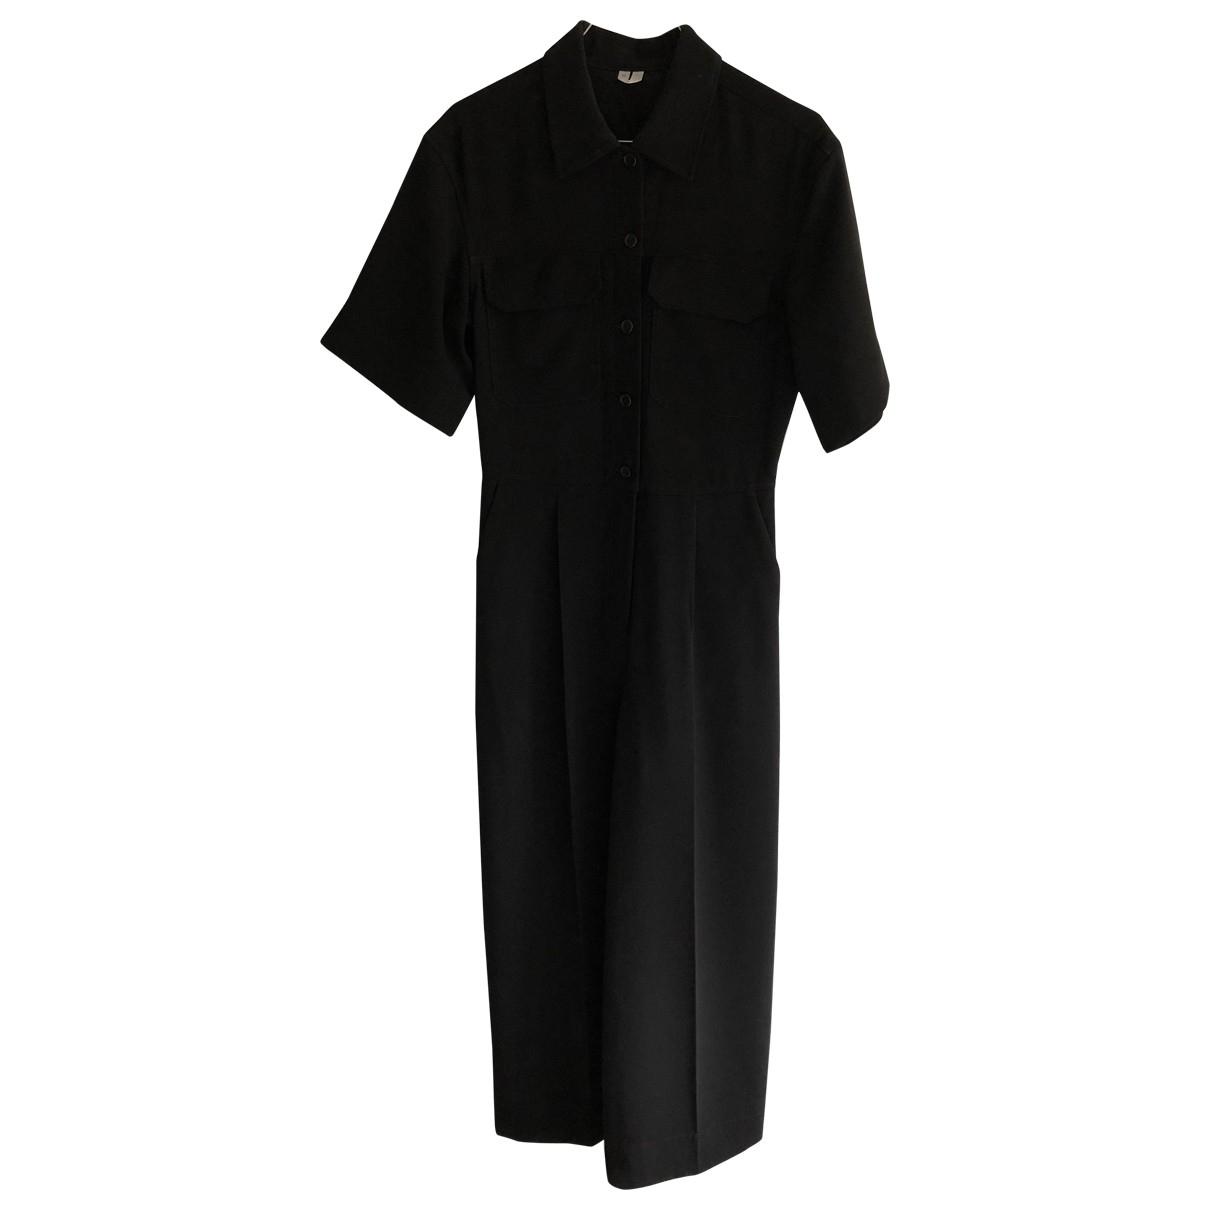 Arket \N Black jumpsuit for Women 34 FR